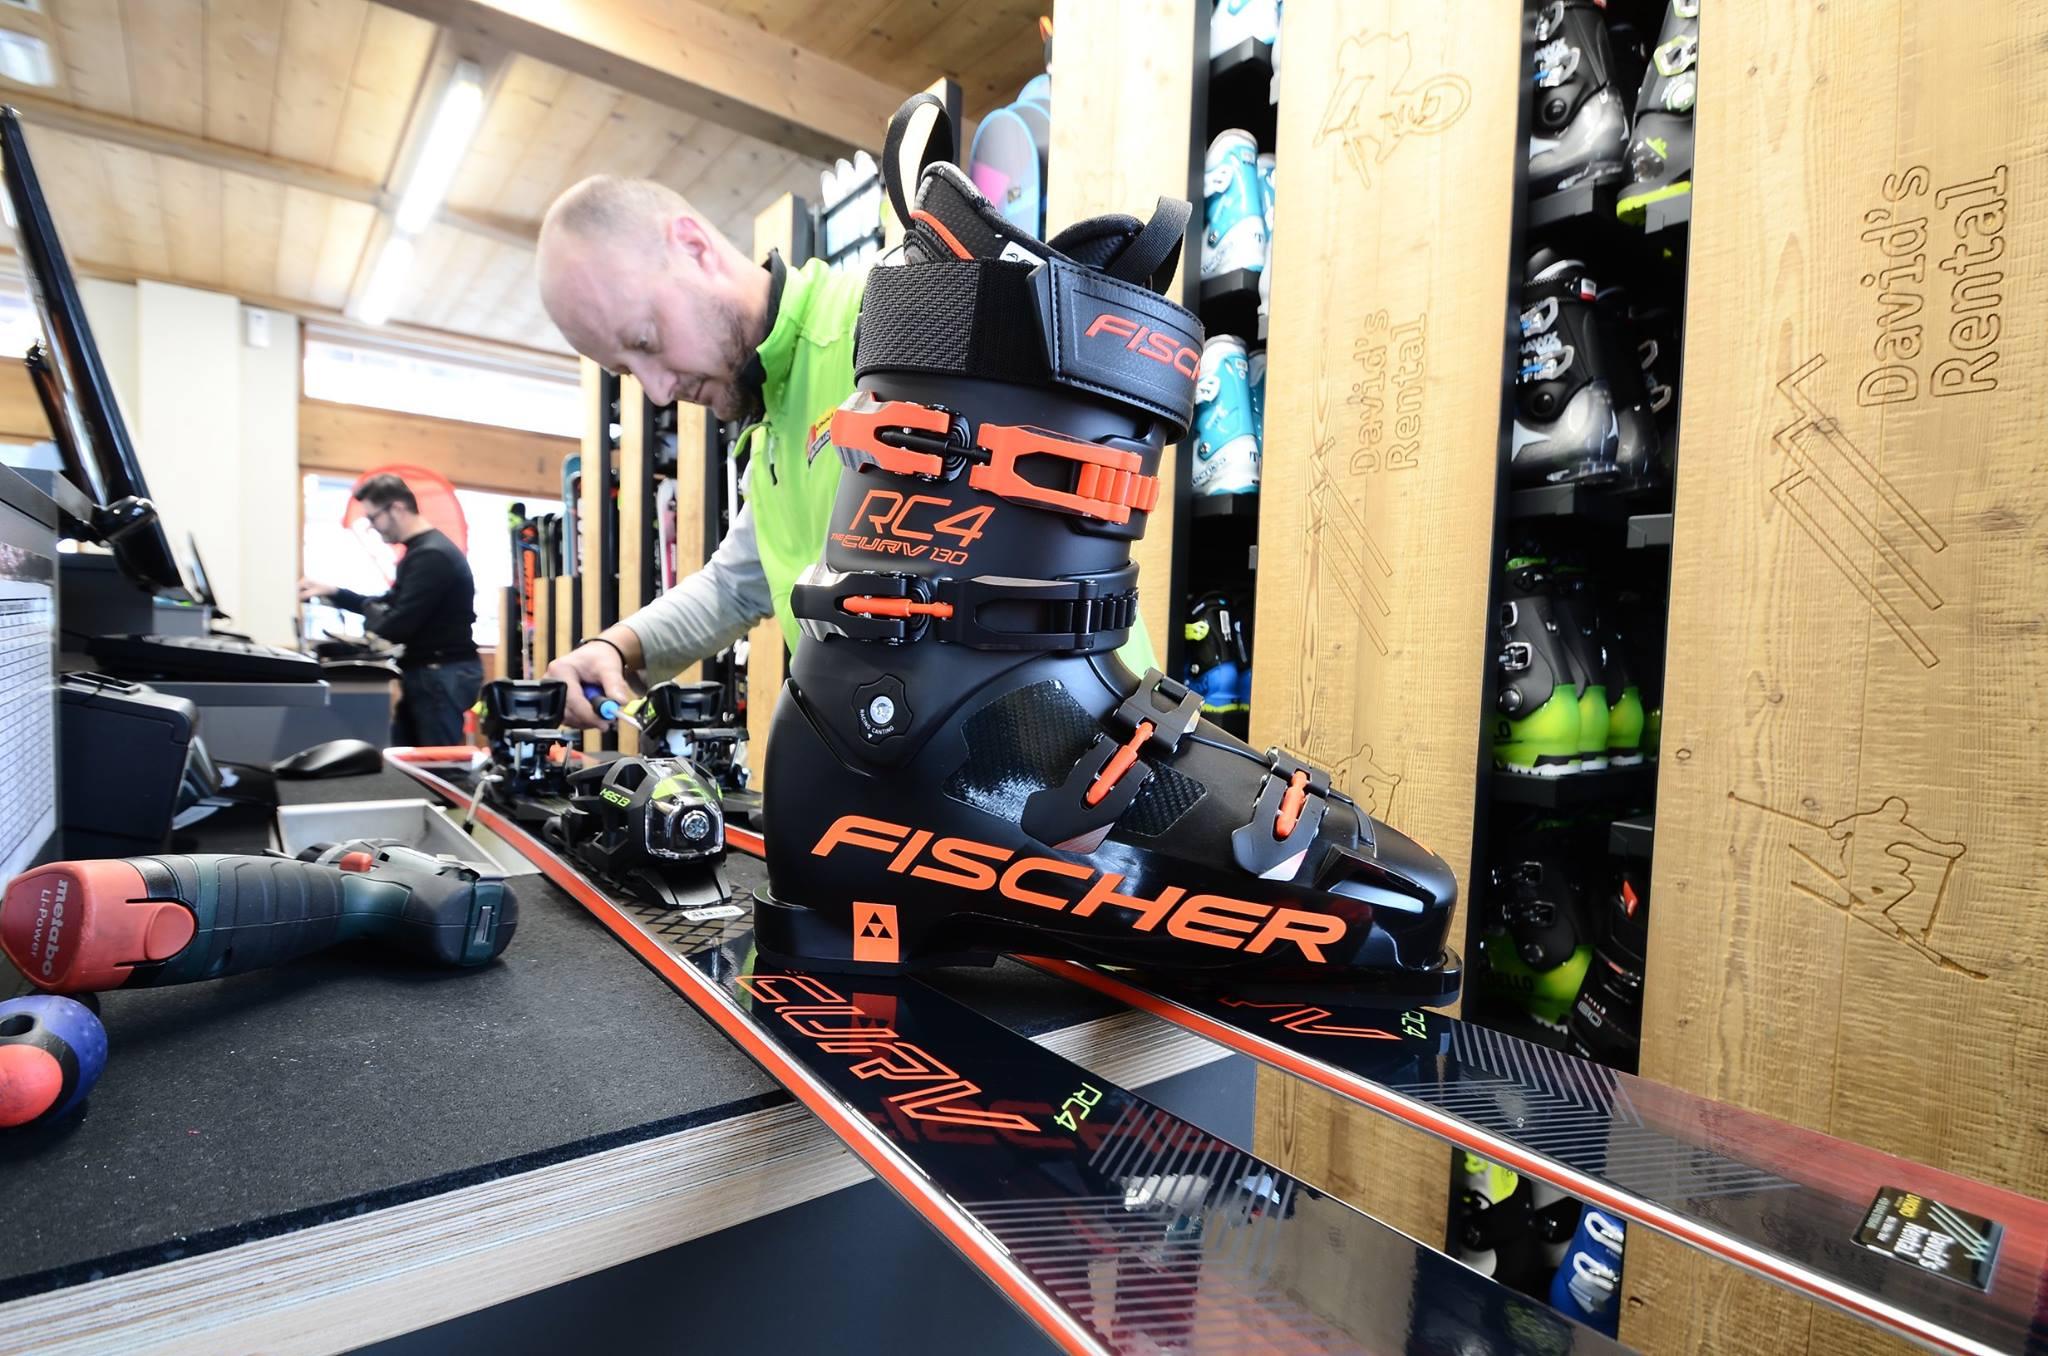 david-rental-ski-livigno-3